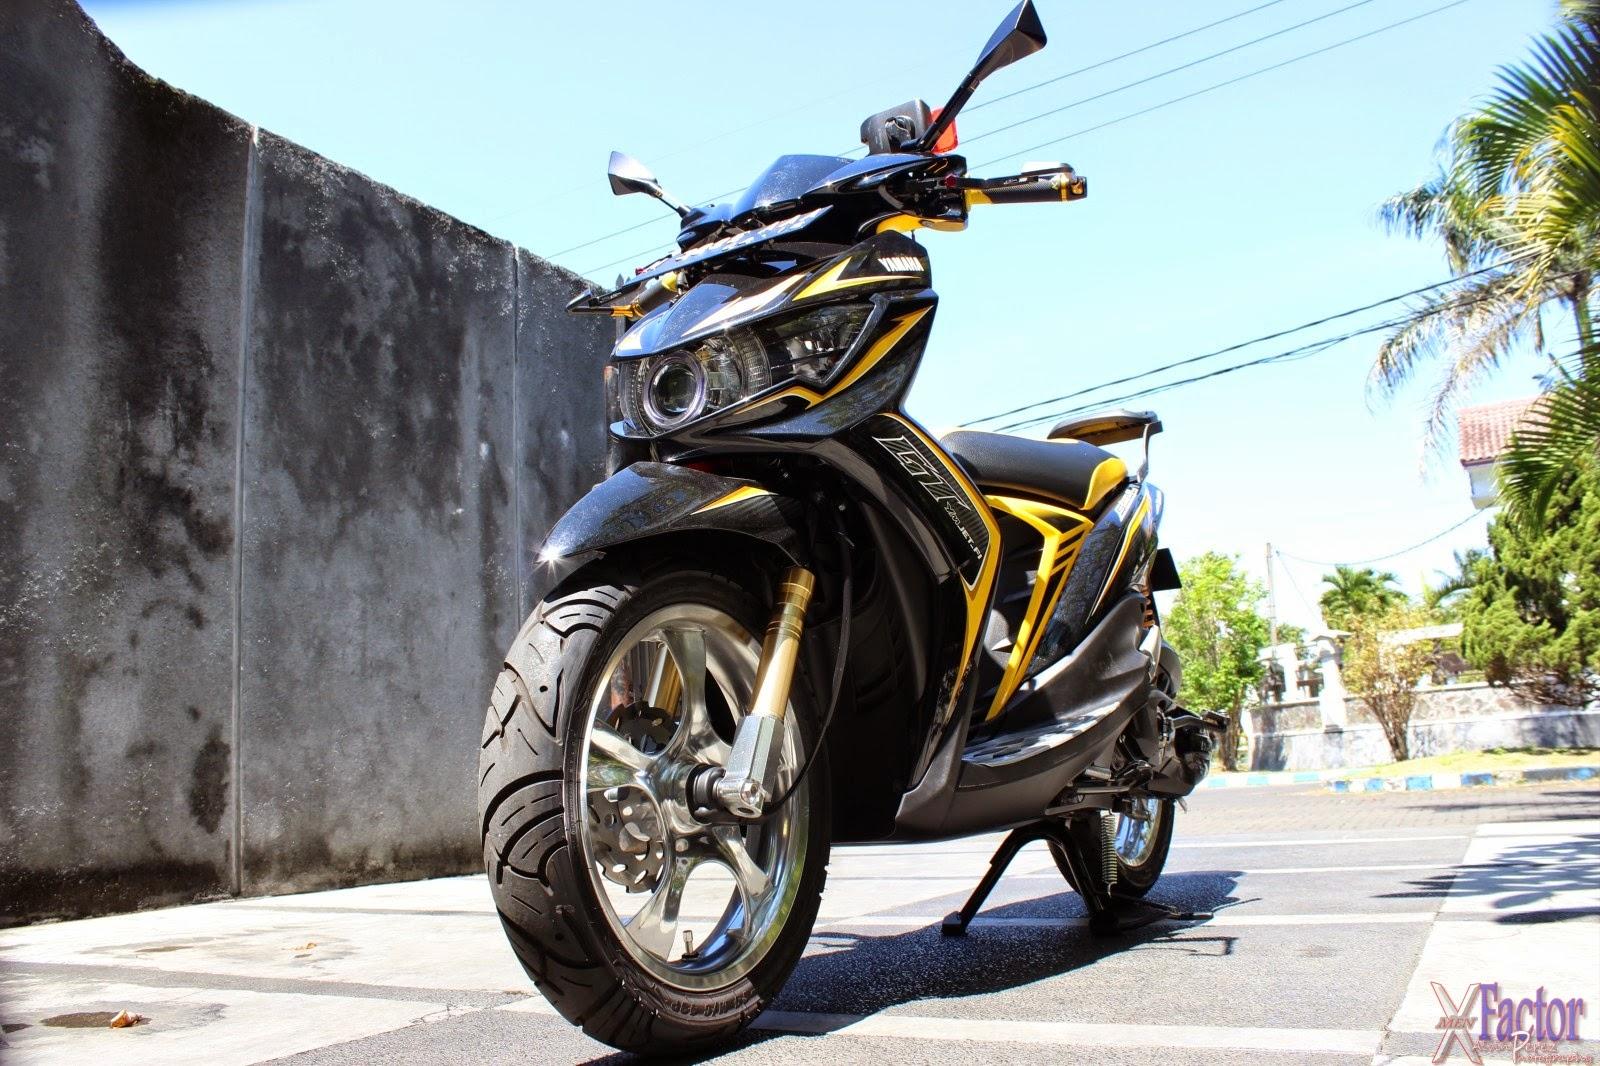 Foto Modifikasi Motor Yamaha Mio Soul Terbaru